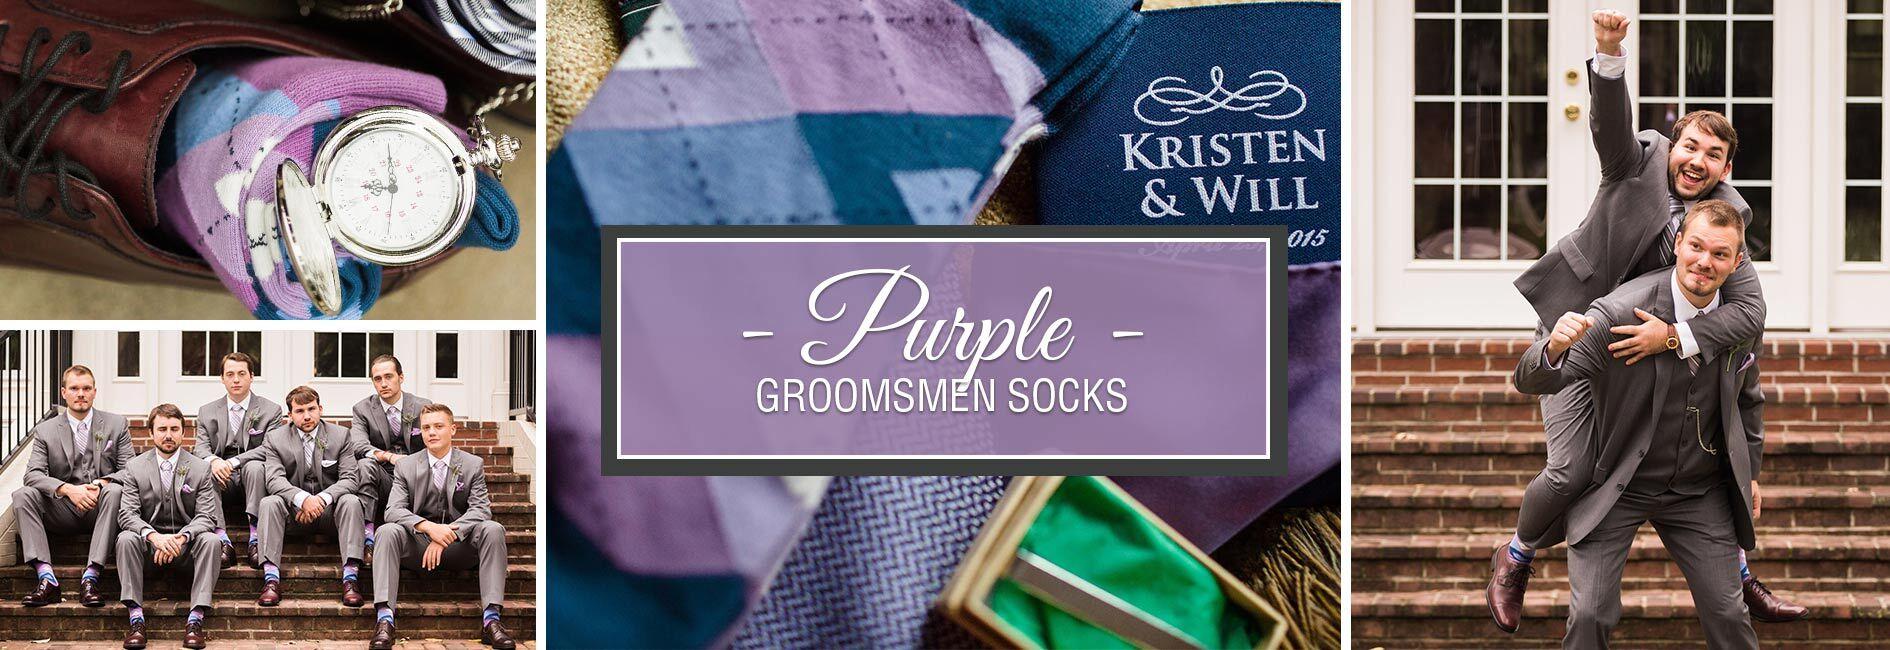 Purple Groomsmen Wedding Socks Banner